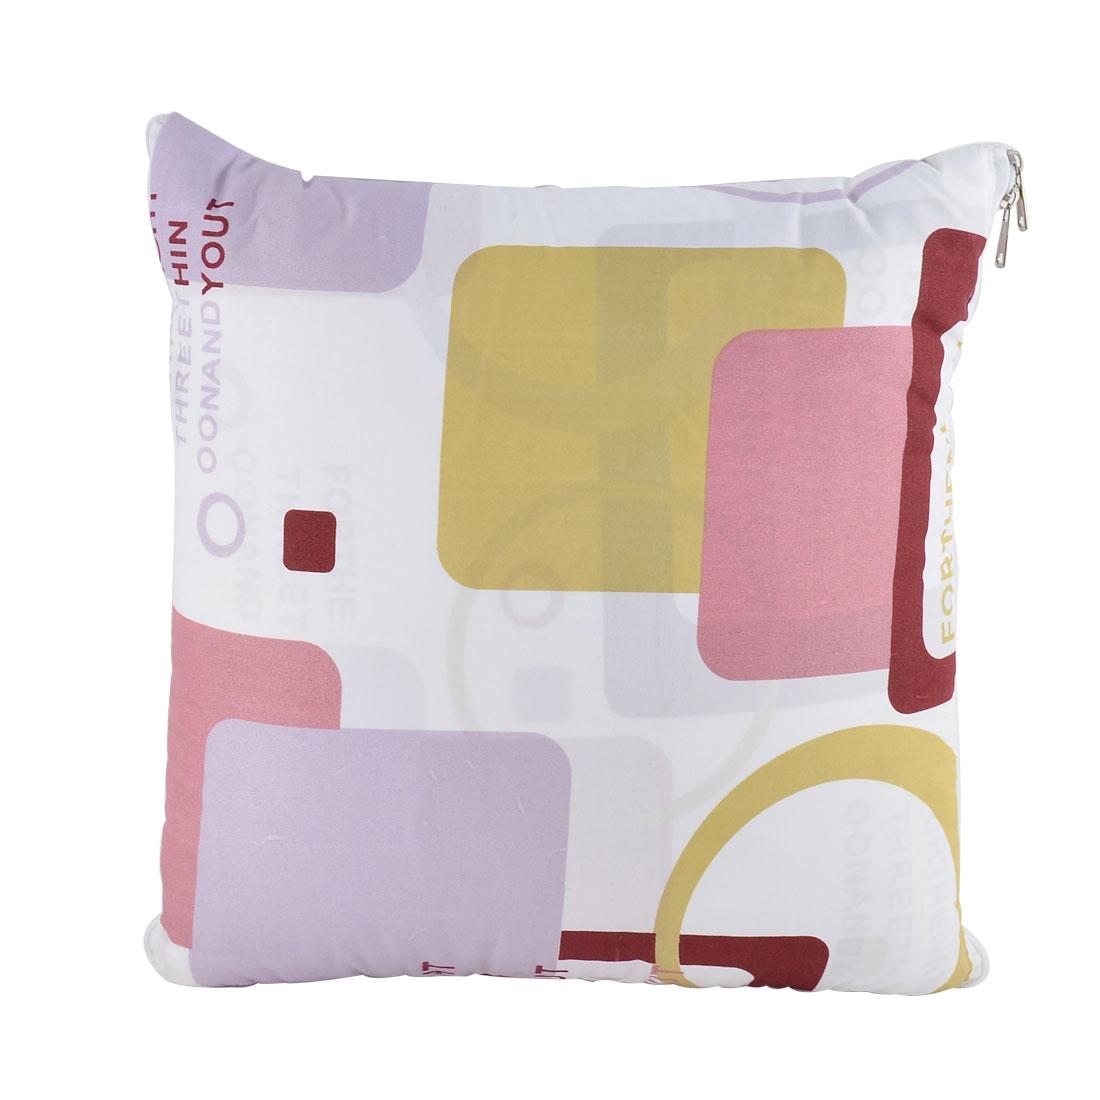 Home Office Car Cotton Blends Graph Print Zippered Pillow Cushion Quilt Dual 40 x 40cm